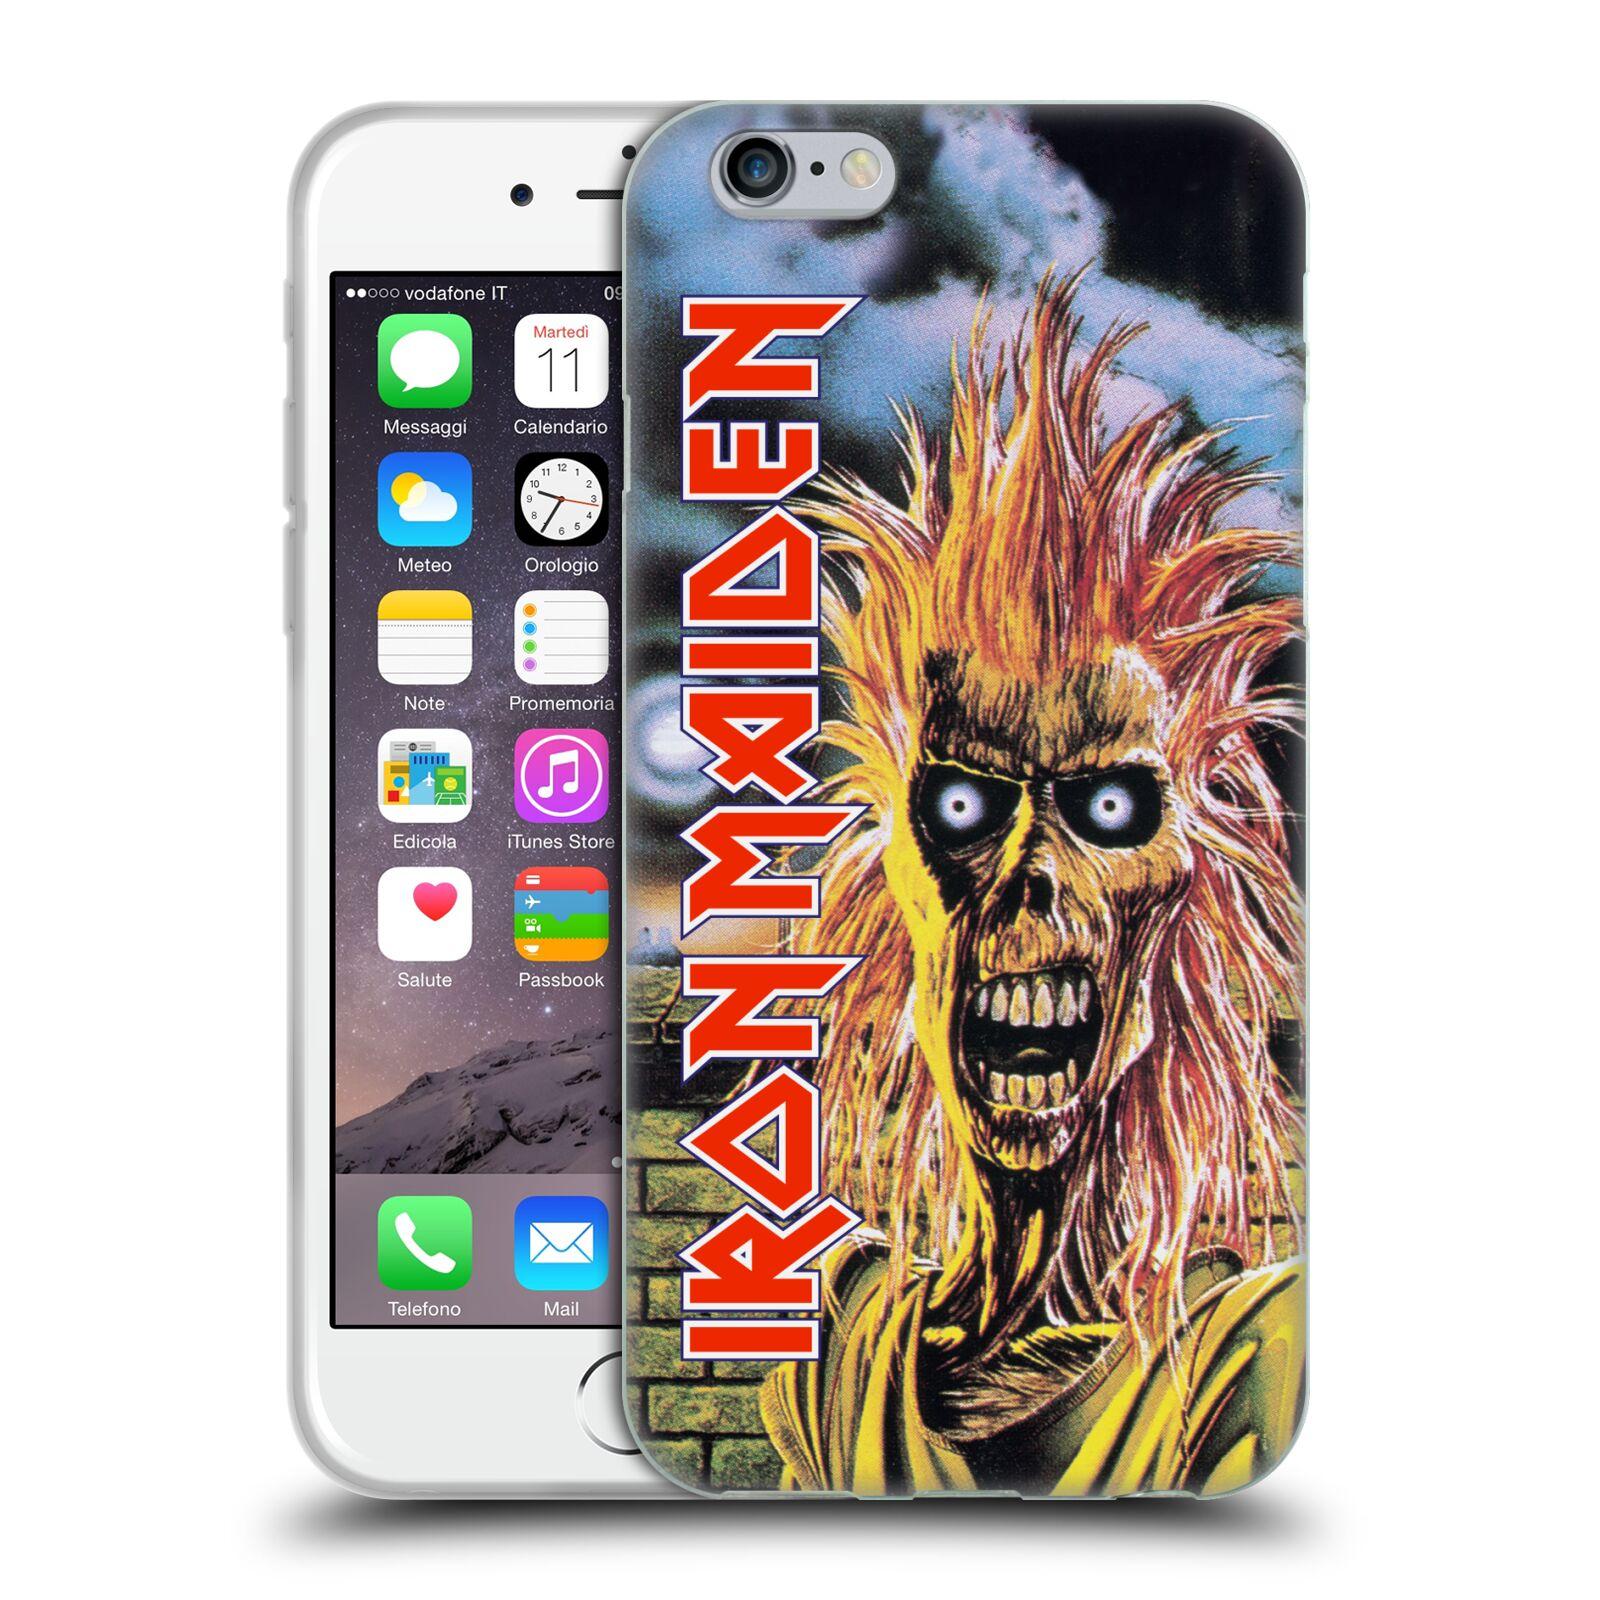 Wallpaper Iphone Iron Maiden: OFFICIAL IRON MAIDEN ART SOFT GEL CASE FOR APPLE IPHONE